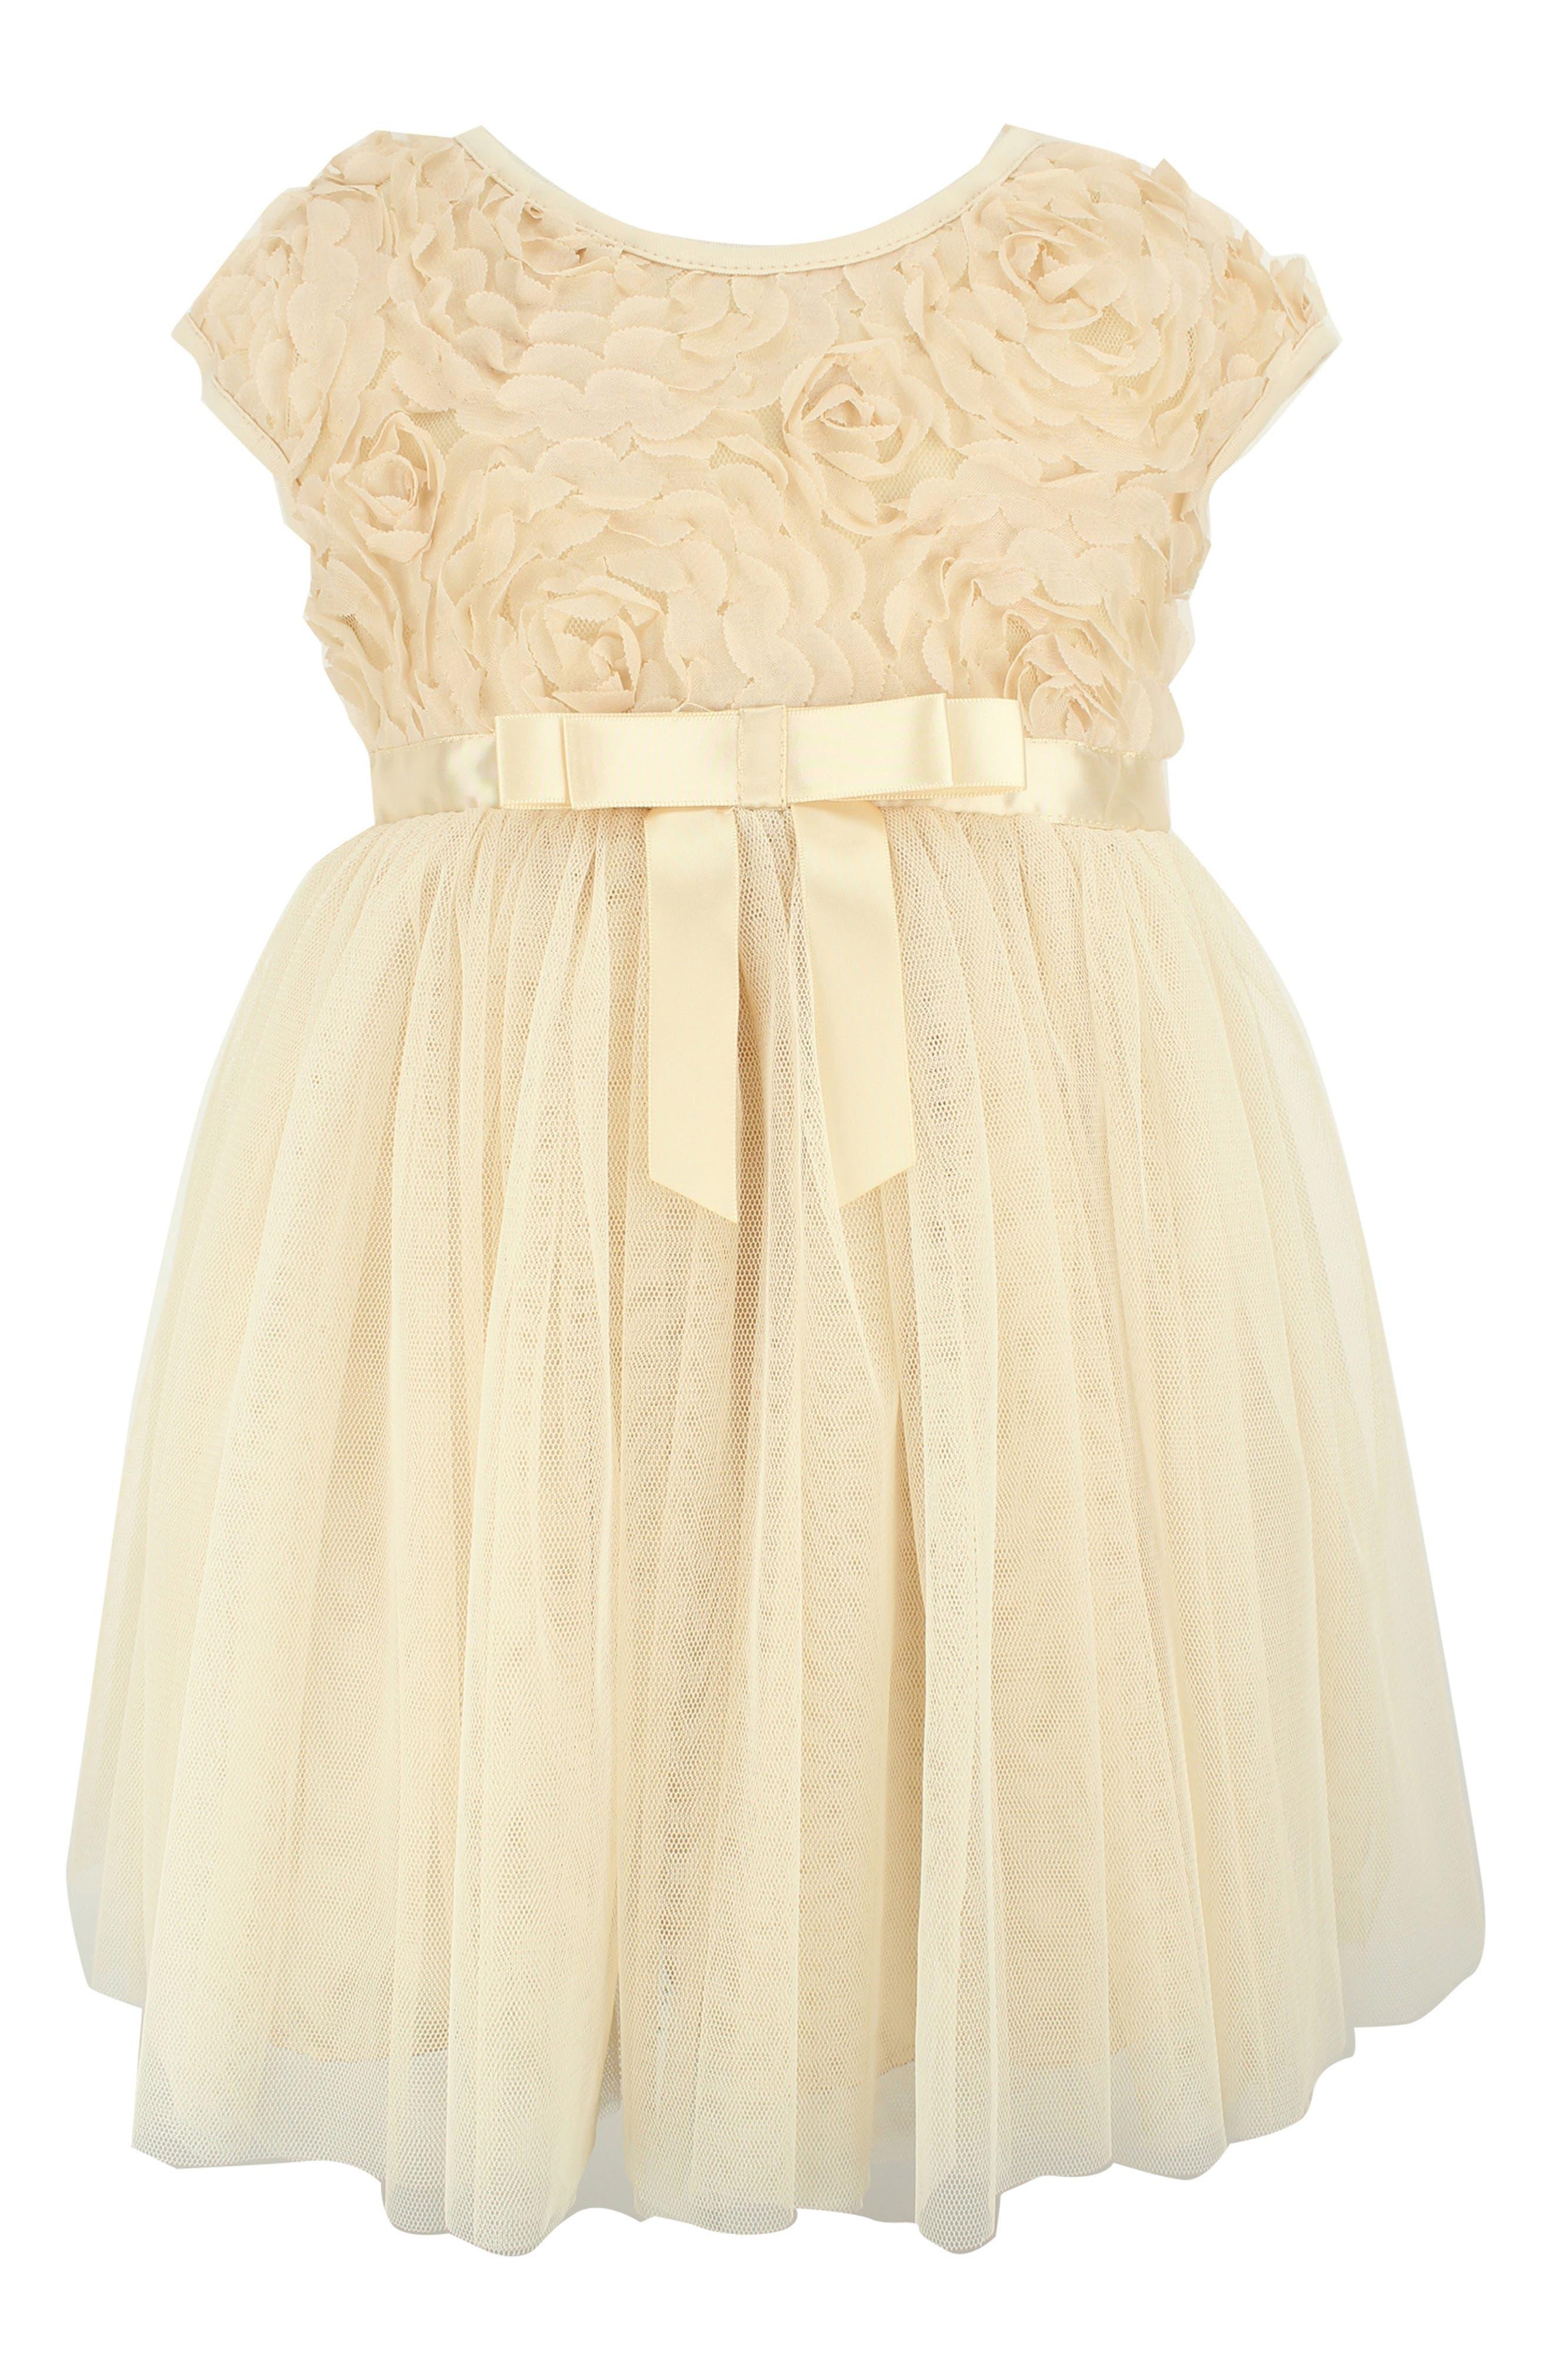 Rosette Tulle Dress,                             Main thumbnail 1, color,                             IVORY